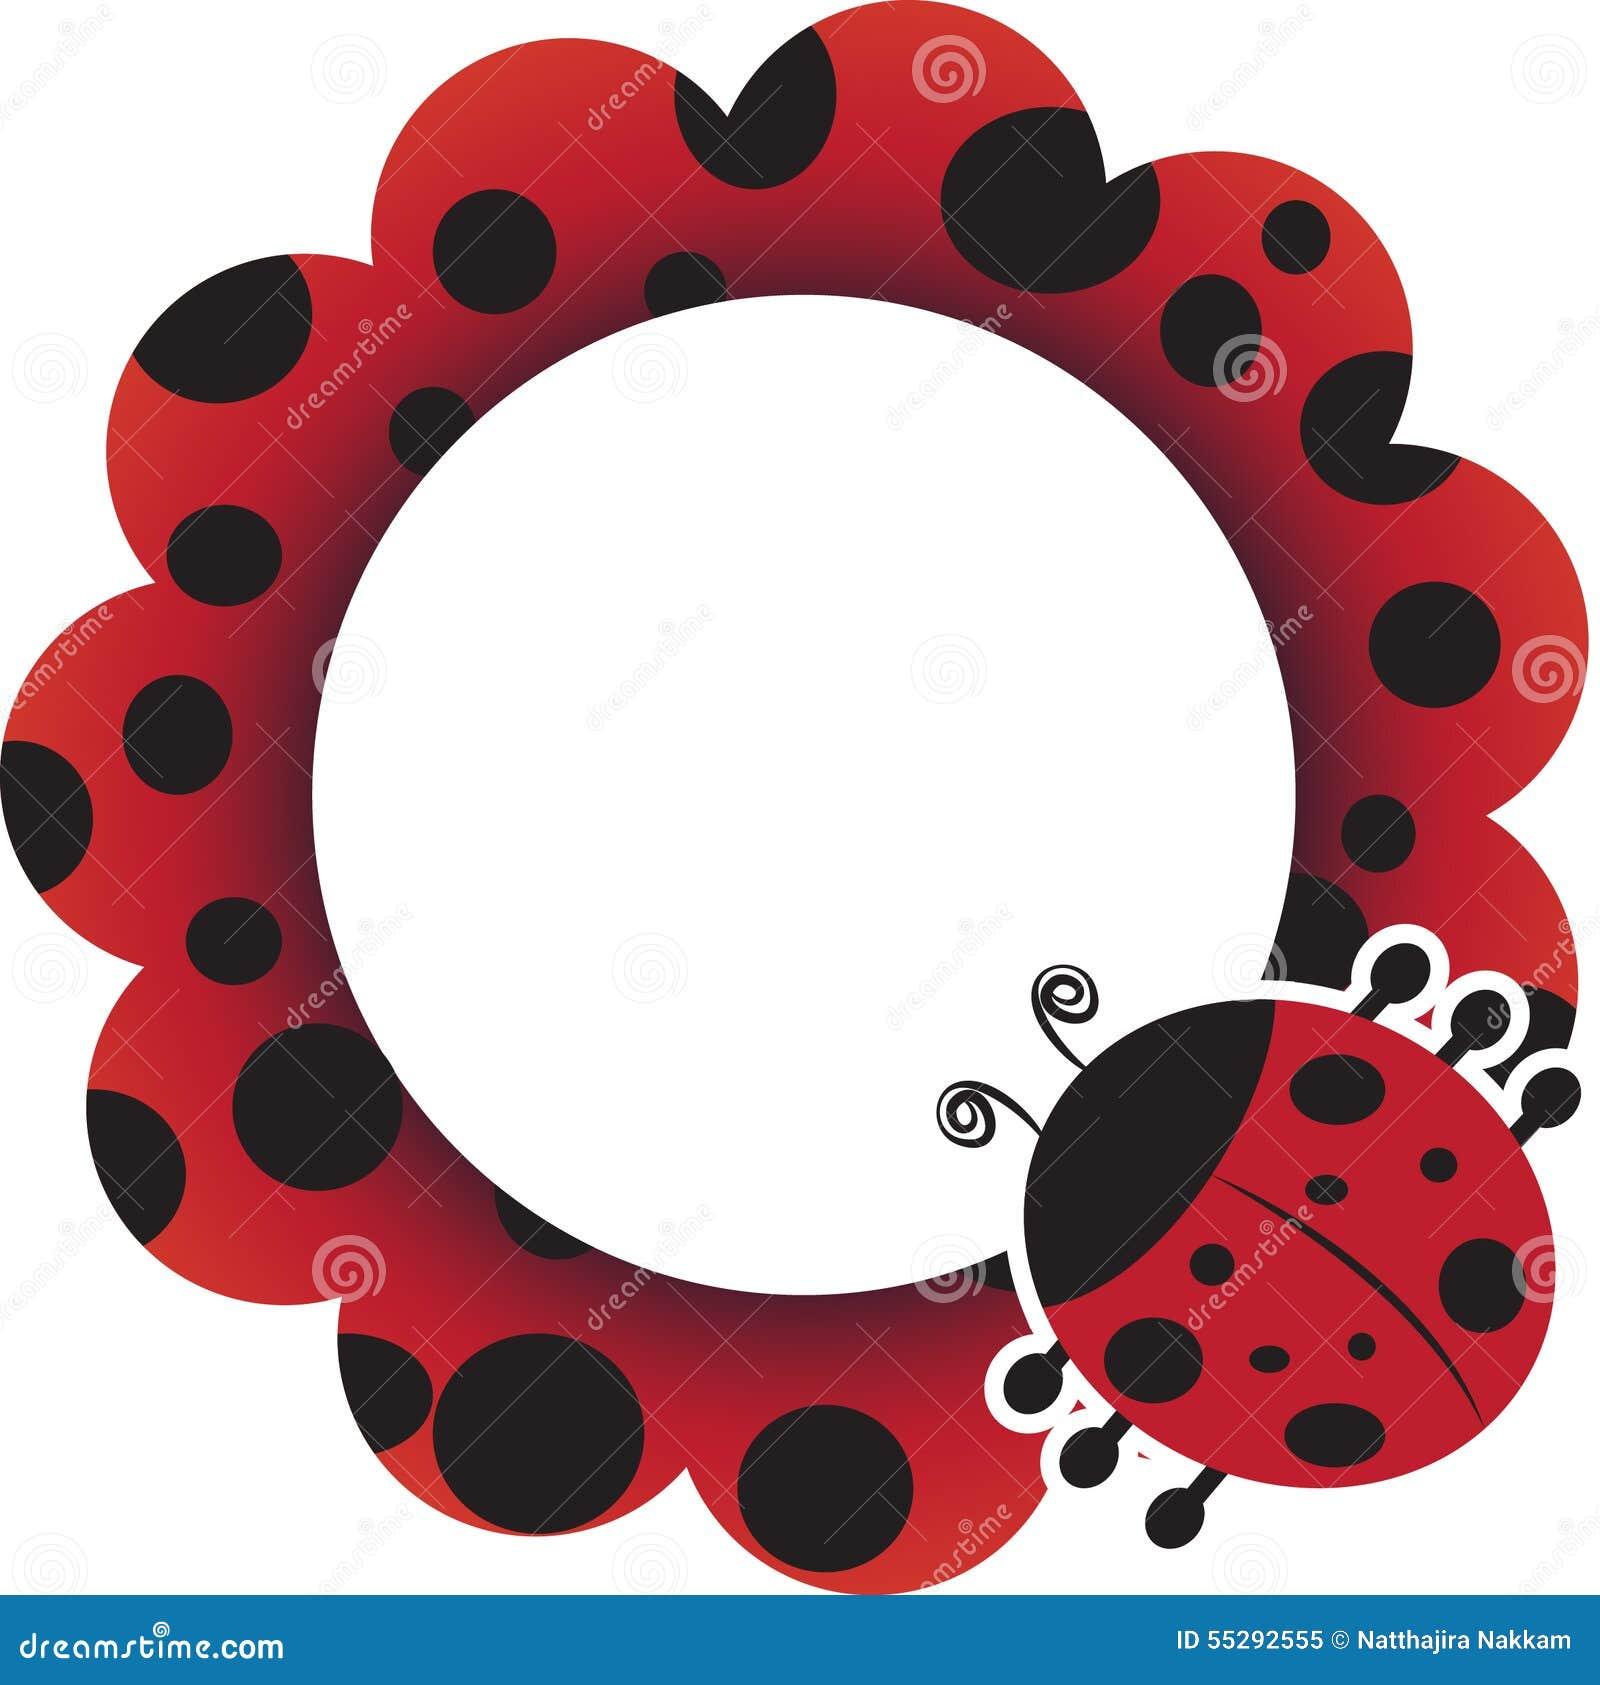 Ladybug Frame Illustration 55292555 - Megapixl